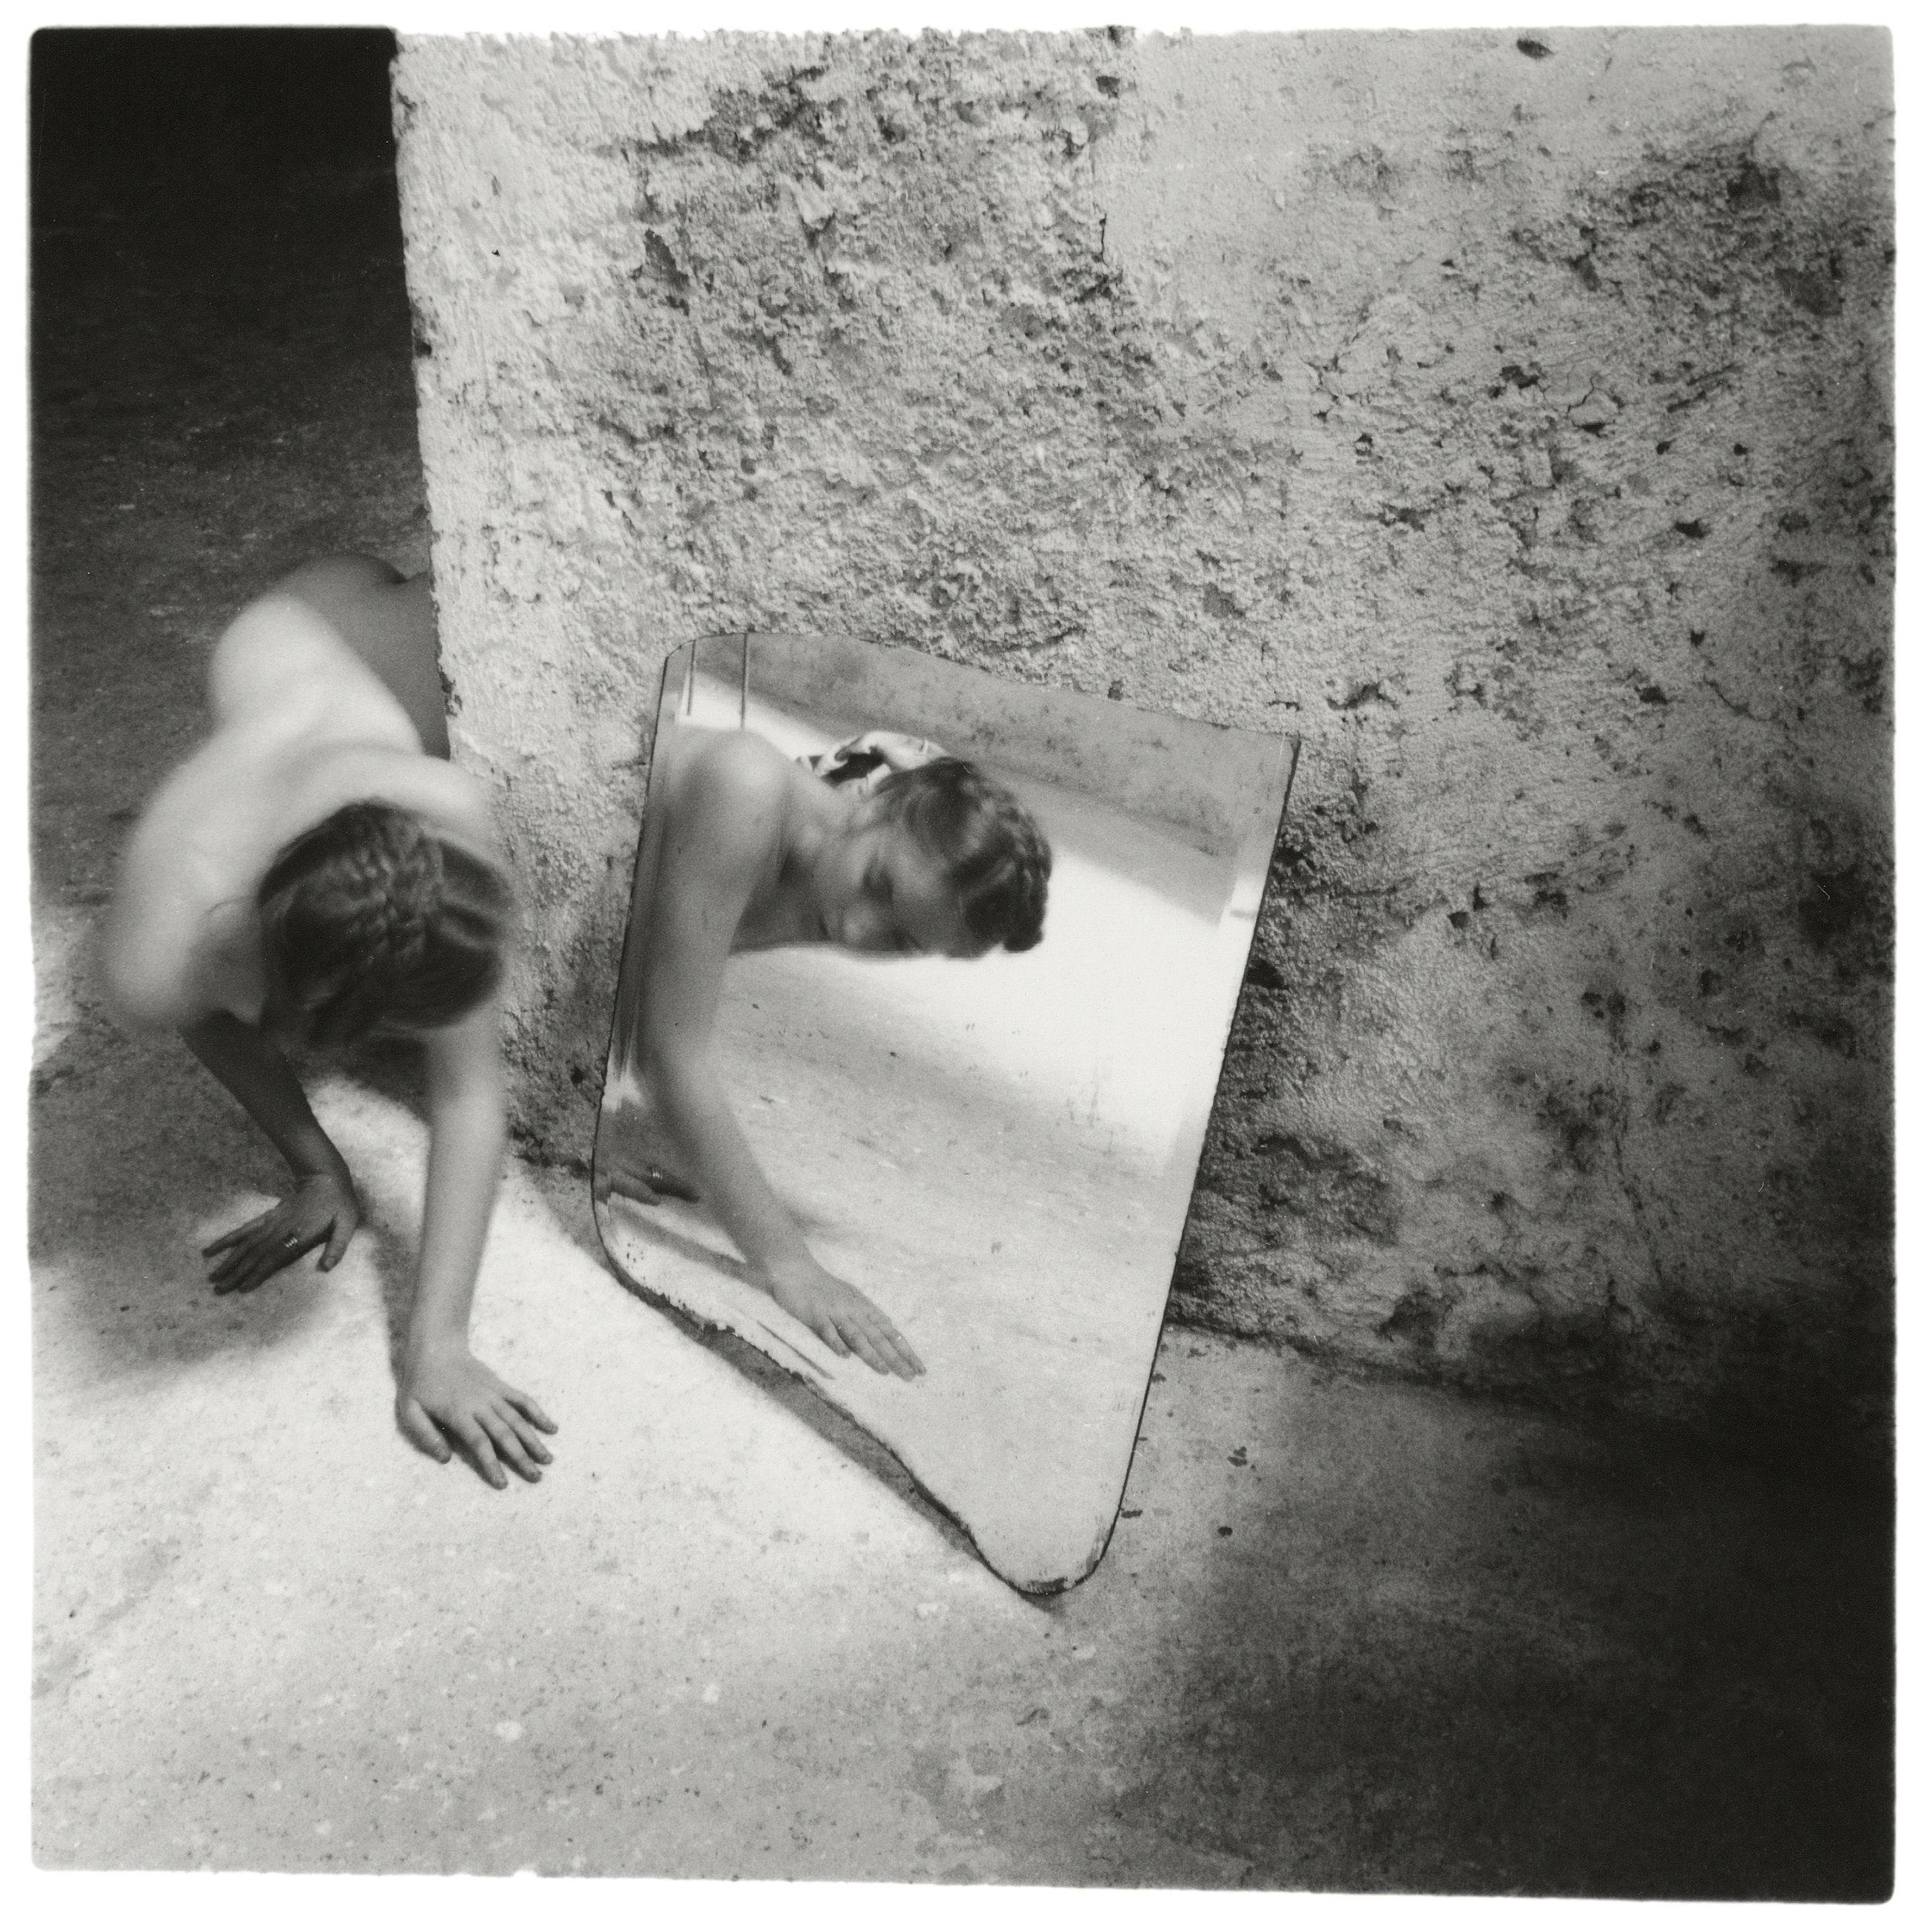 Francesca Woodman, Self-deceit #1, Rome, Italy, 1978 © George and Betty Woodman